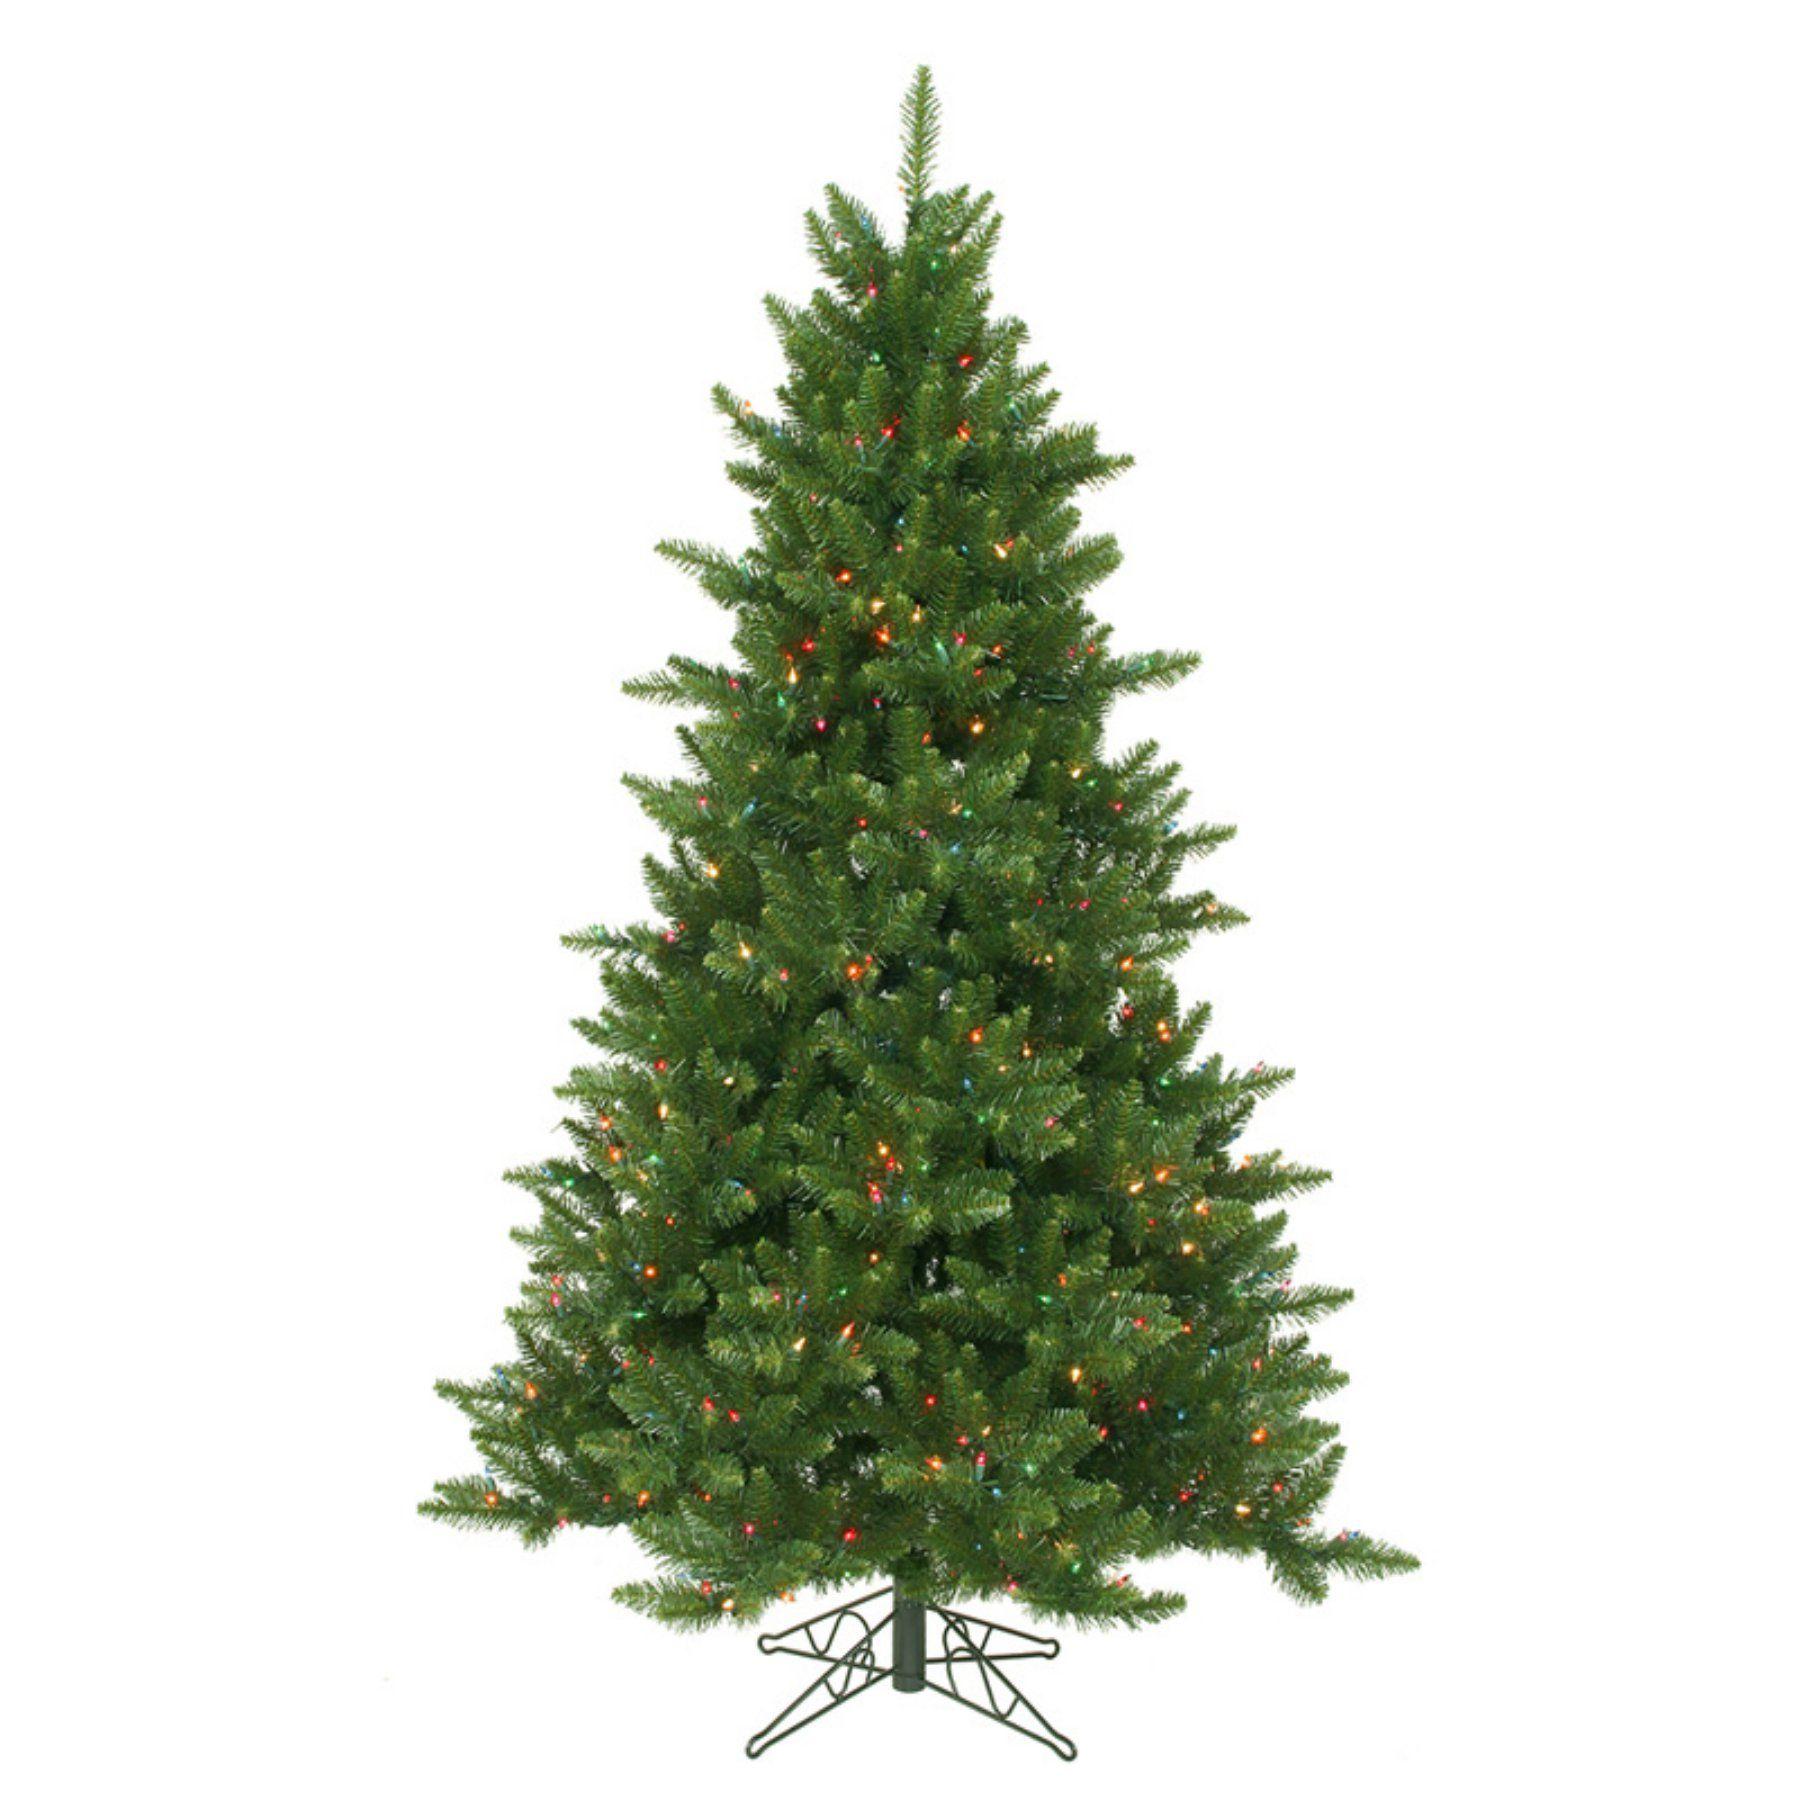 Vickerman 5.5 ft. Camdon Fir Pre-lit Christmas Tree - A860957LED ...